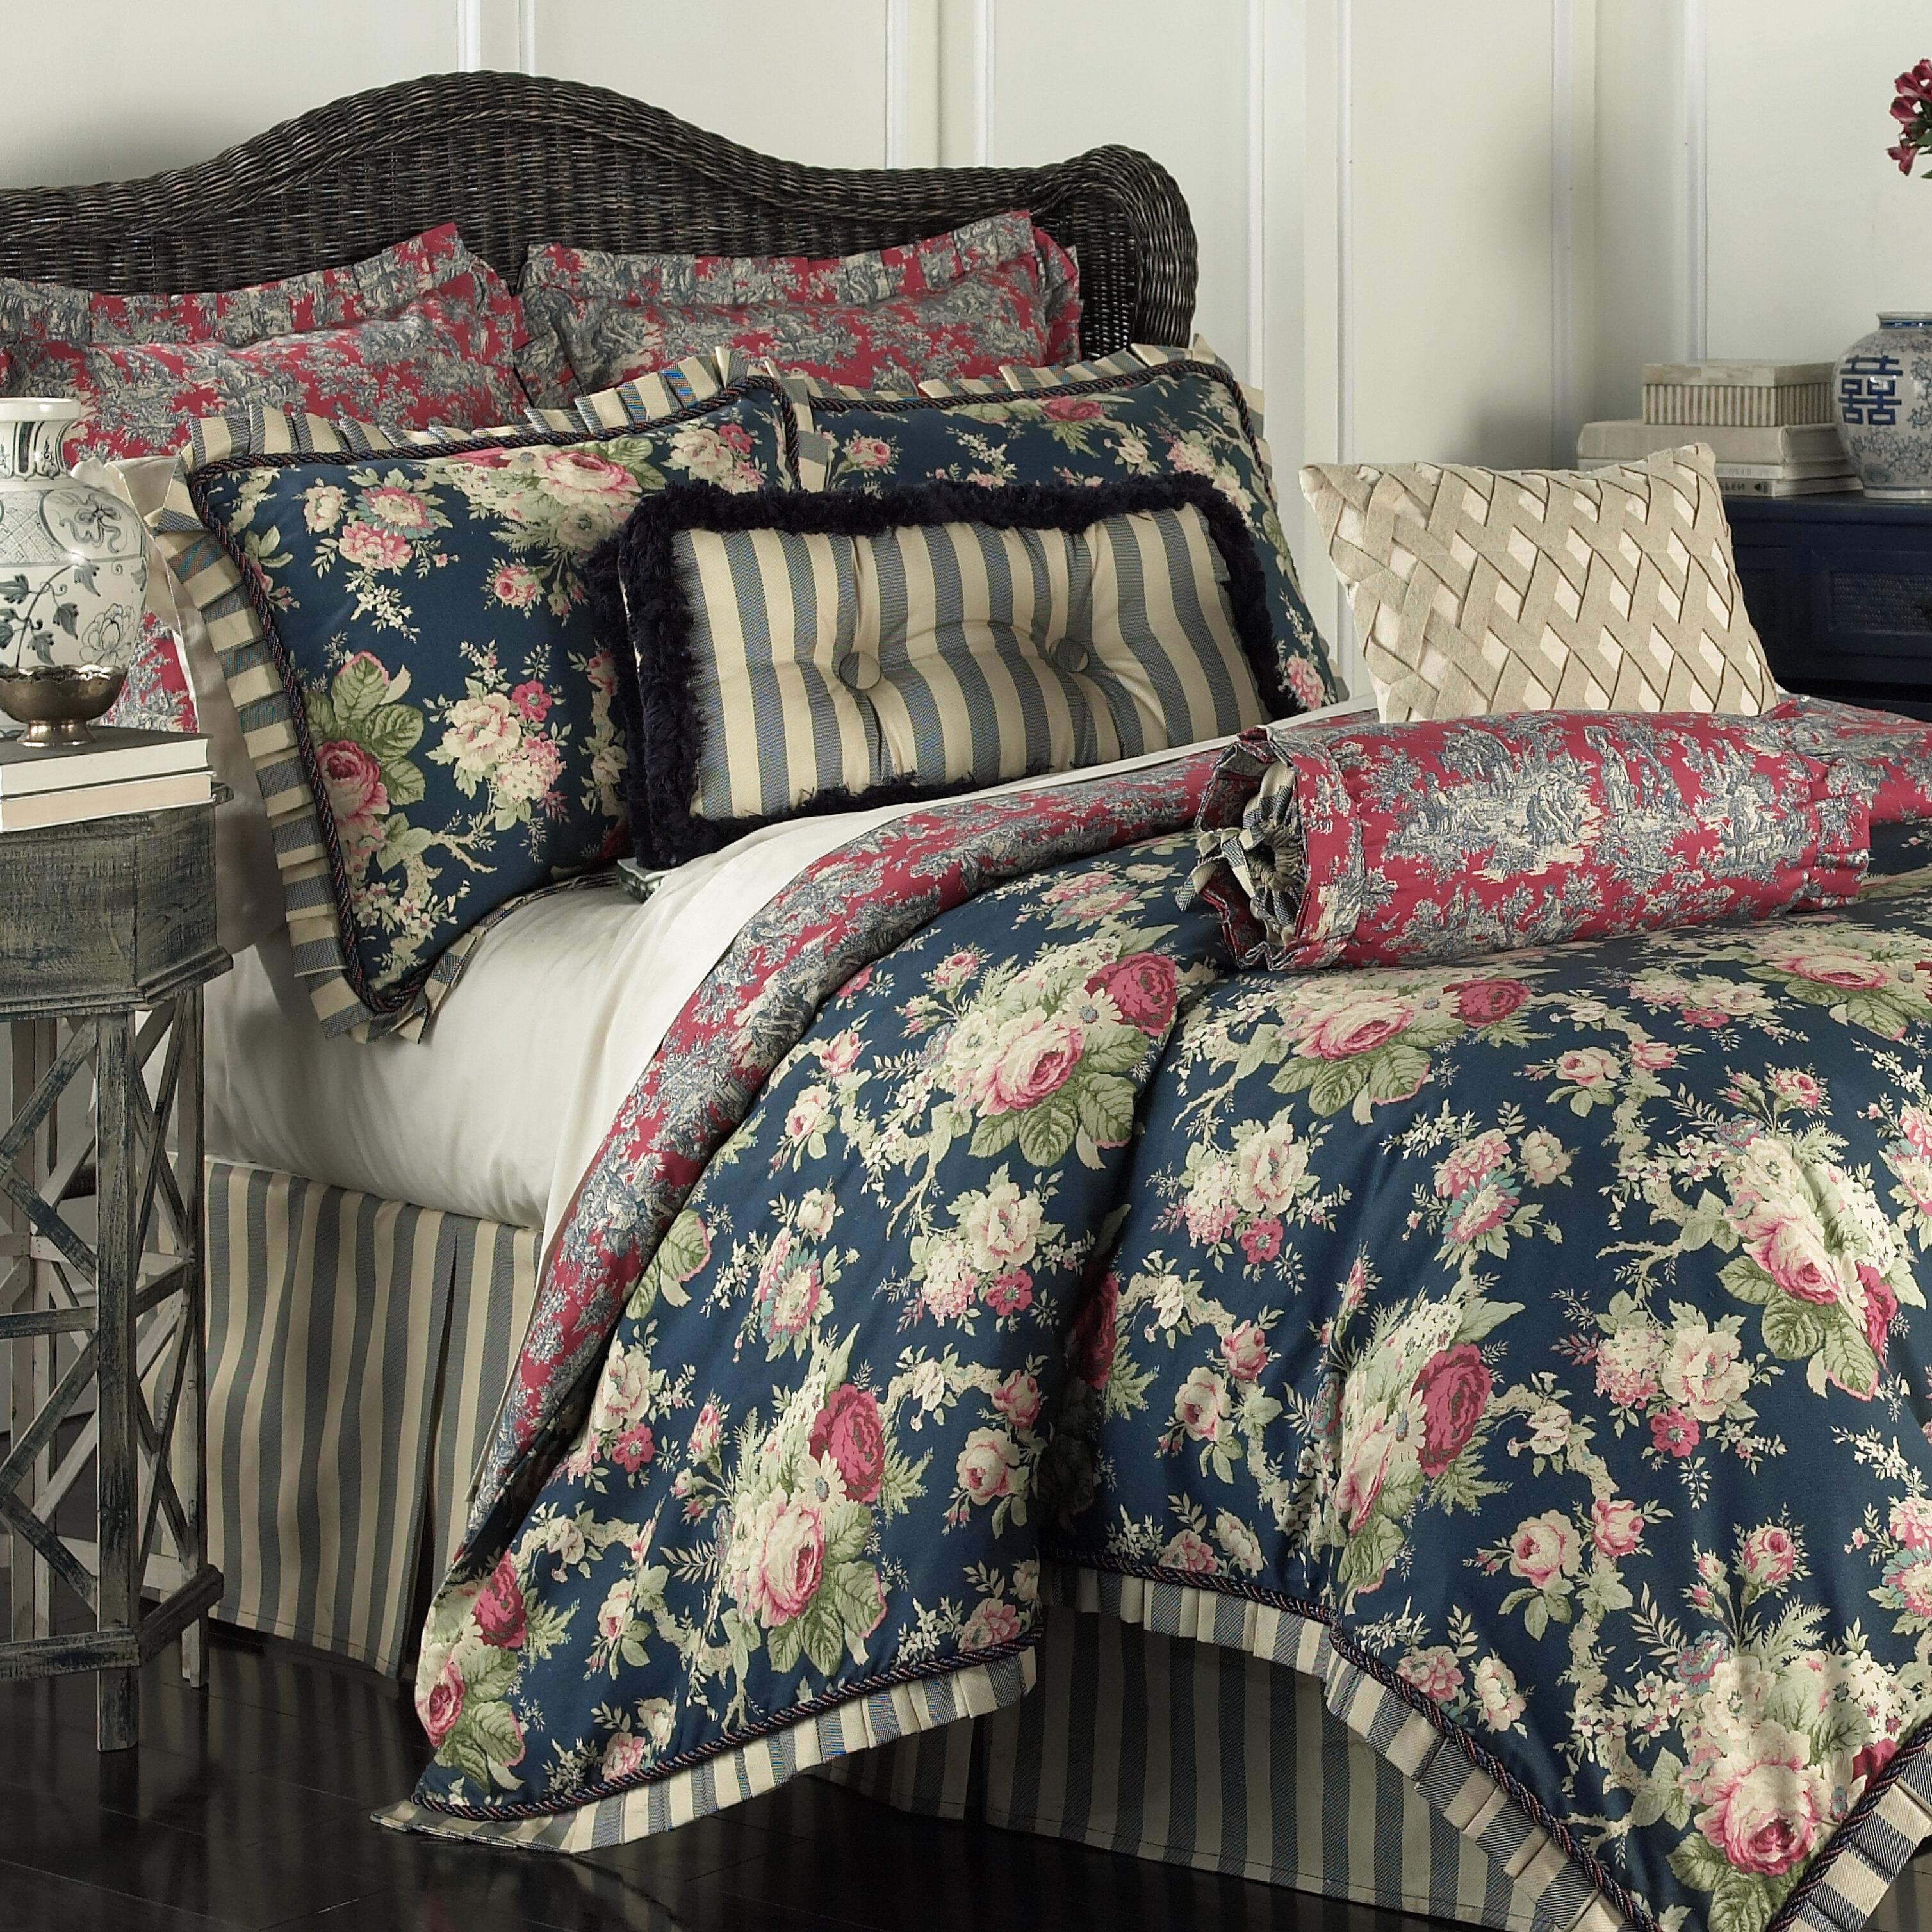 charming Waverly Sanctuary Rose Part - 6: Waverly Sanctuary Rose 4 Piece Reversible Bedding Set u0026 Reviews | Wayfair